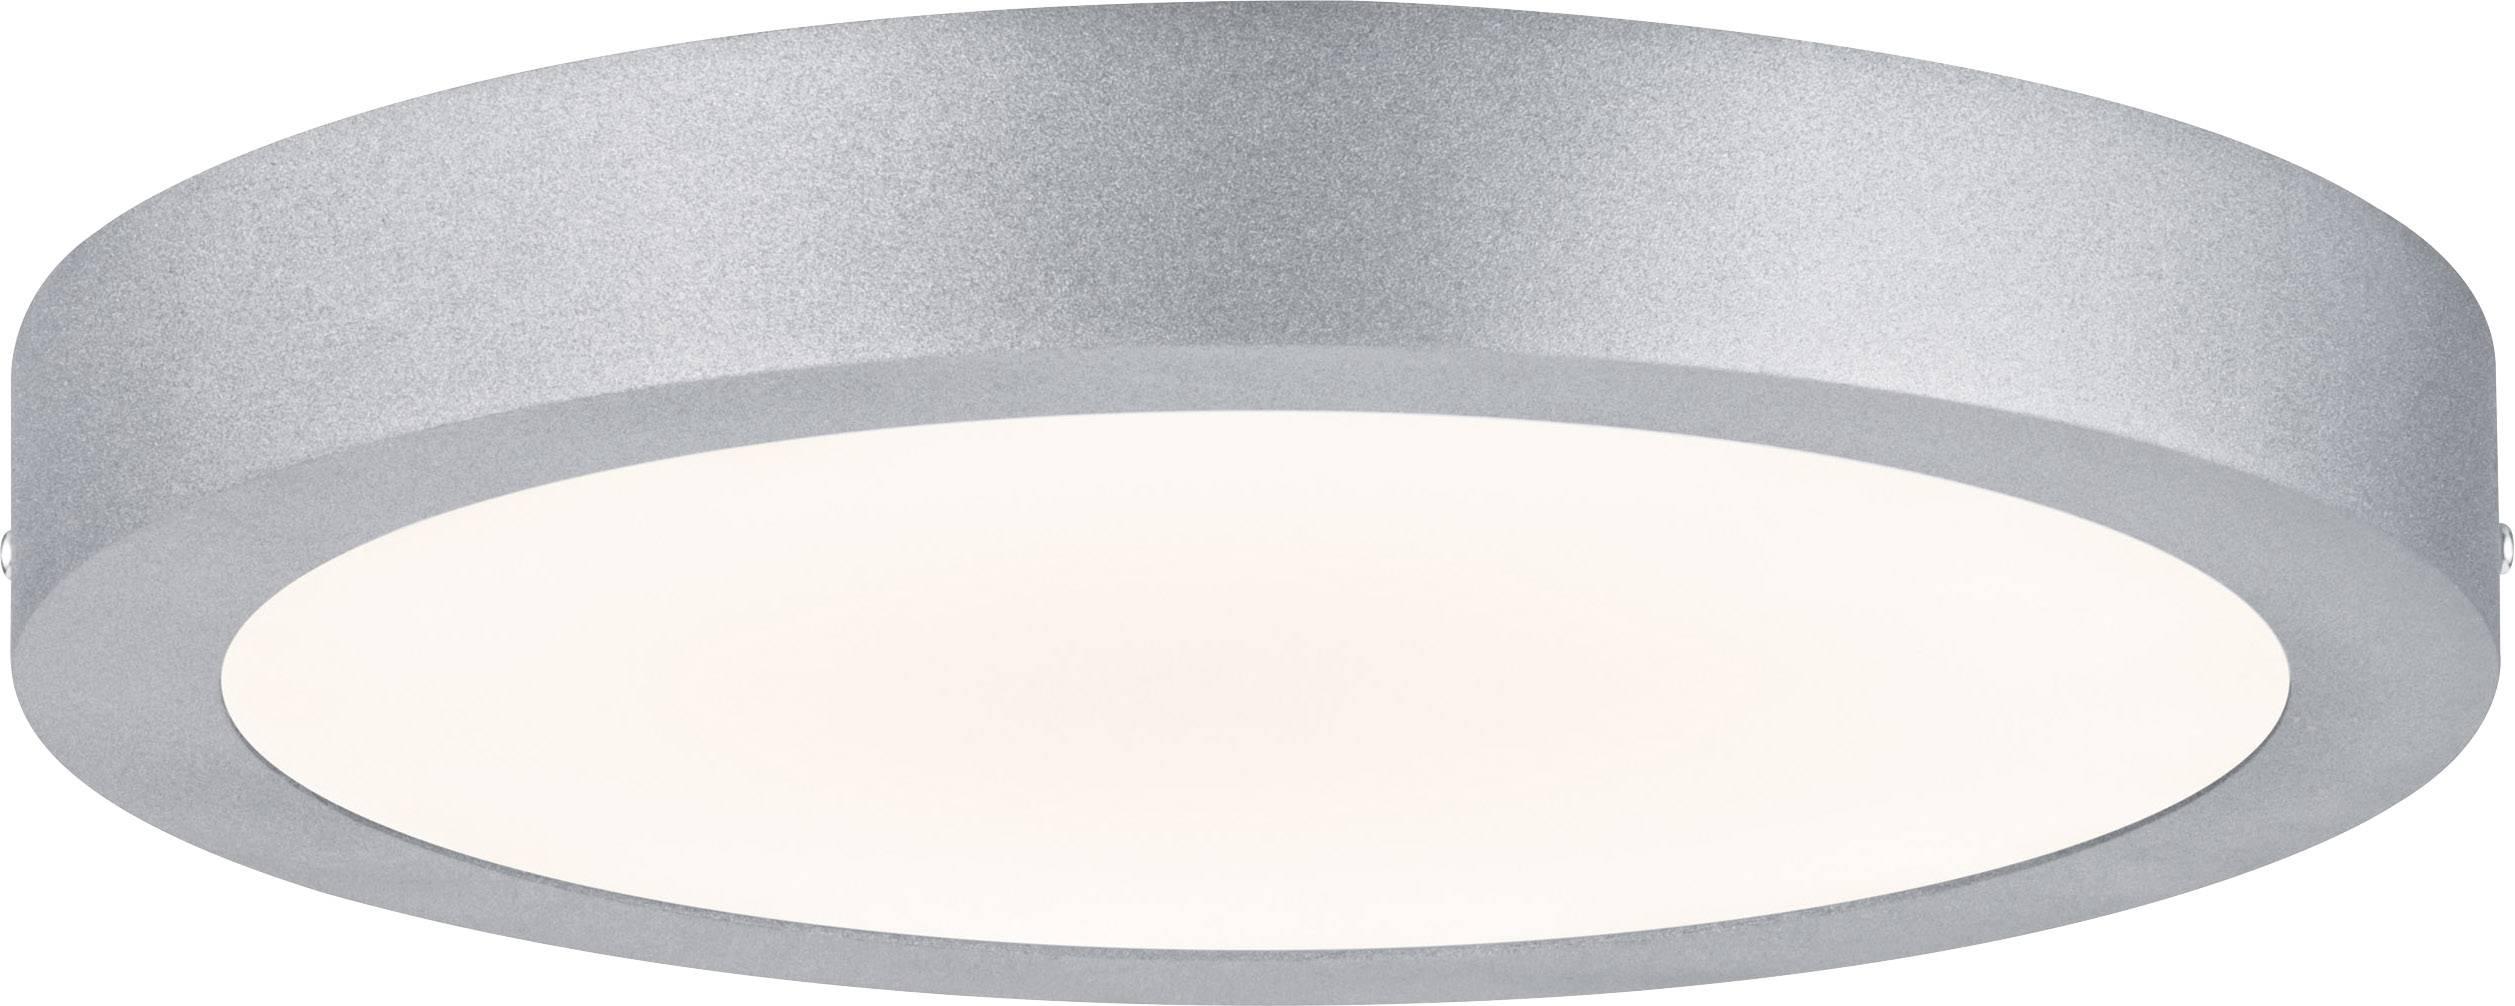 LED panel Paulmann Lunar 706.55, 17 W, teplá biela, chróm (matný)